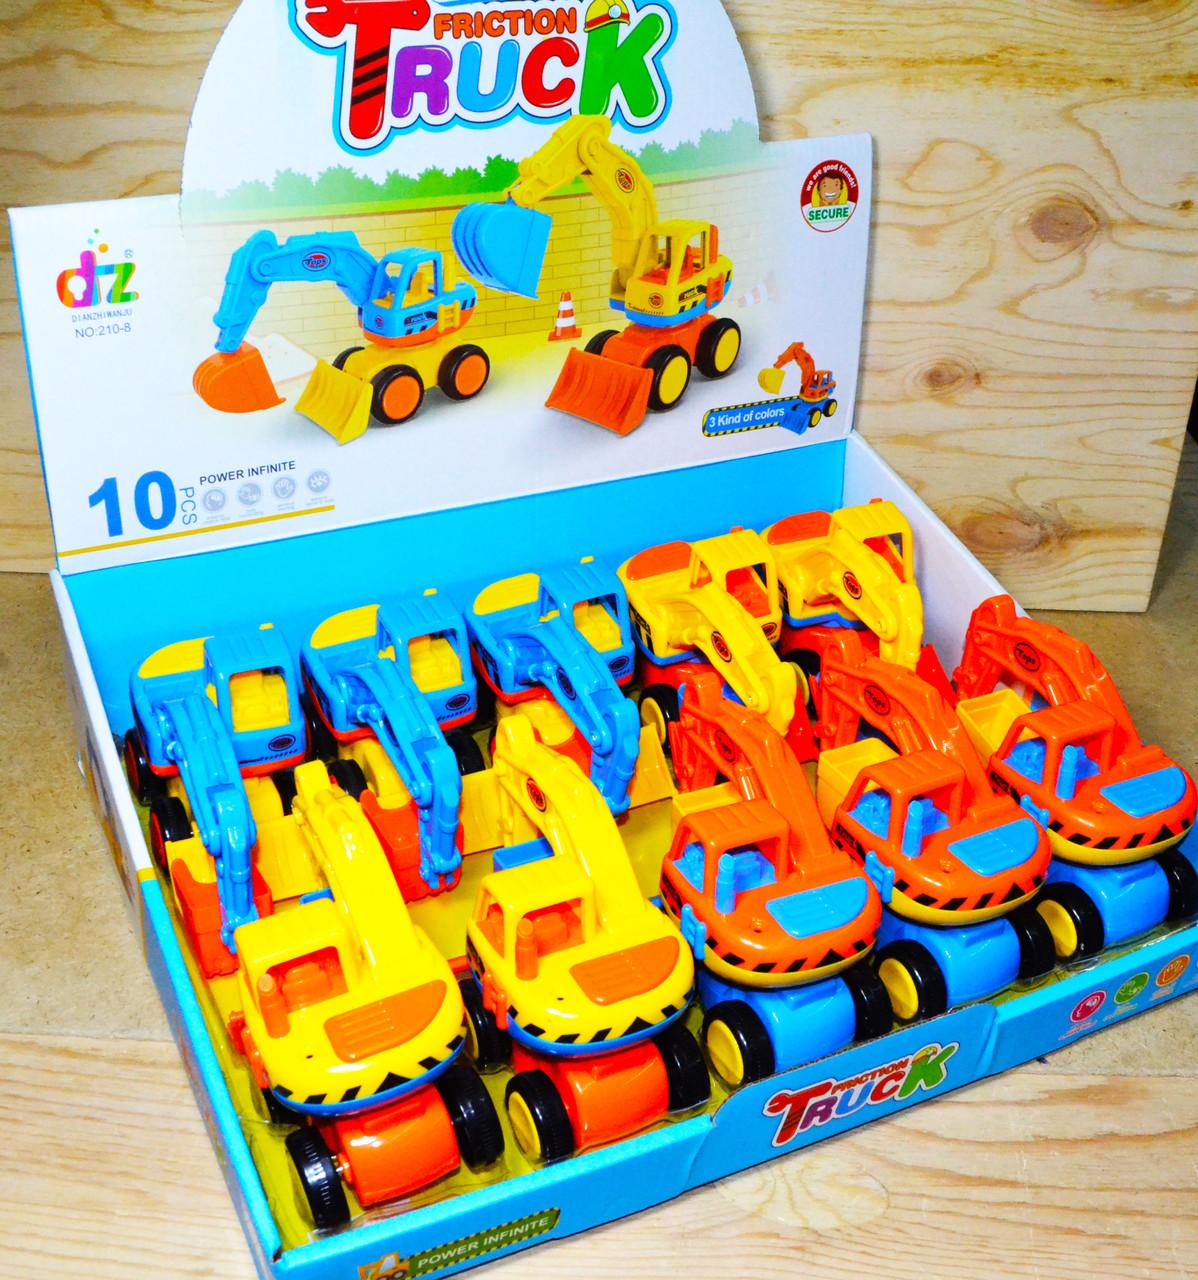 210-8 Cartoon truck Эксковатор 10шт в уп, цена за 1шт 13*10см